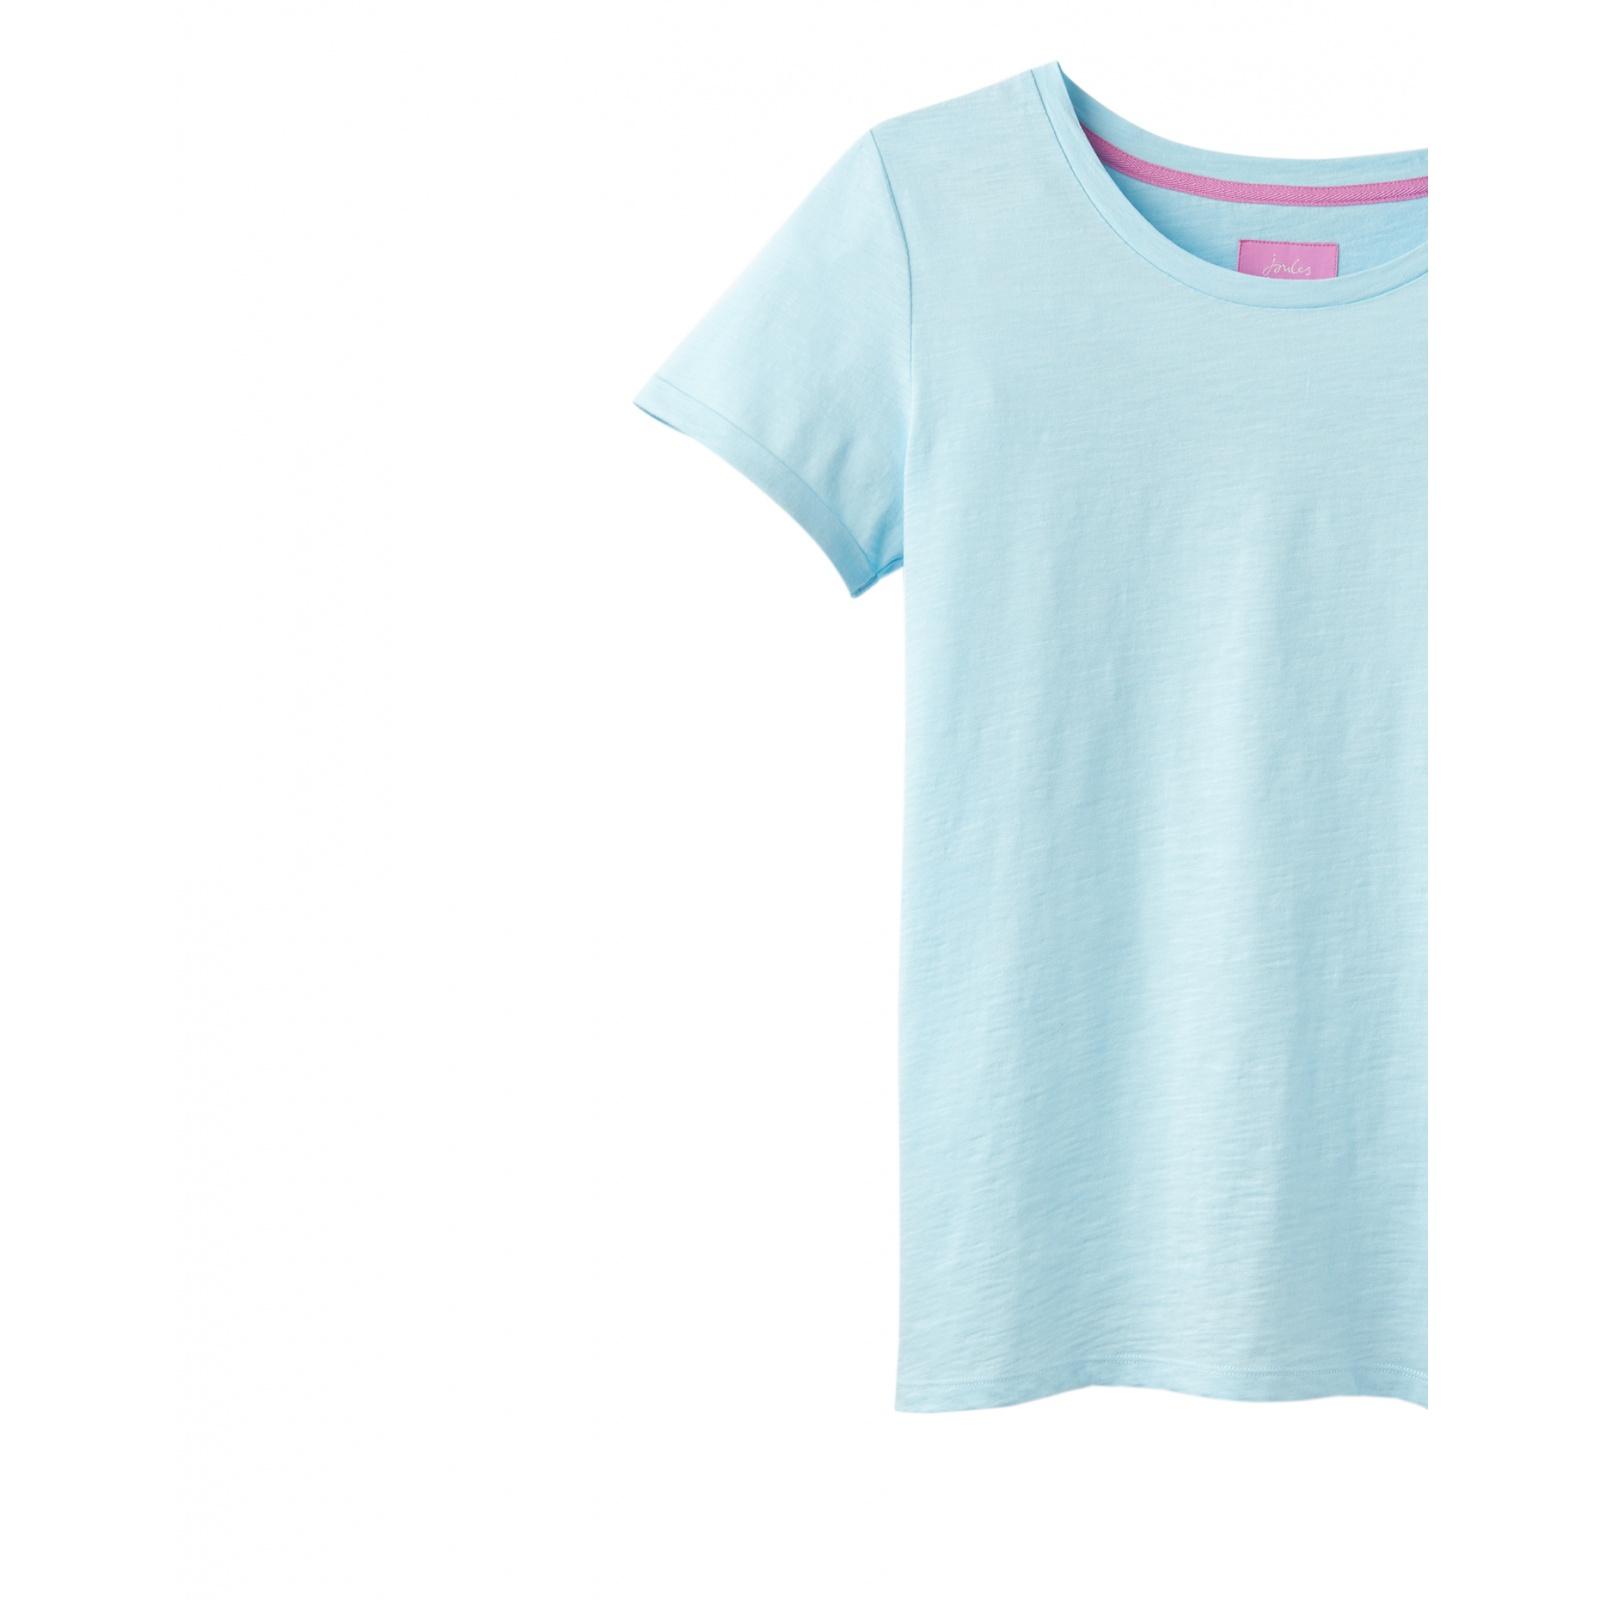 Joules-Nessa-ligero-Jersey-Camiseta-SS19 miniatura 6